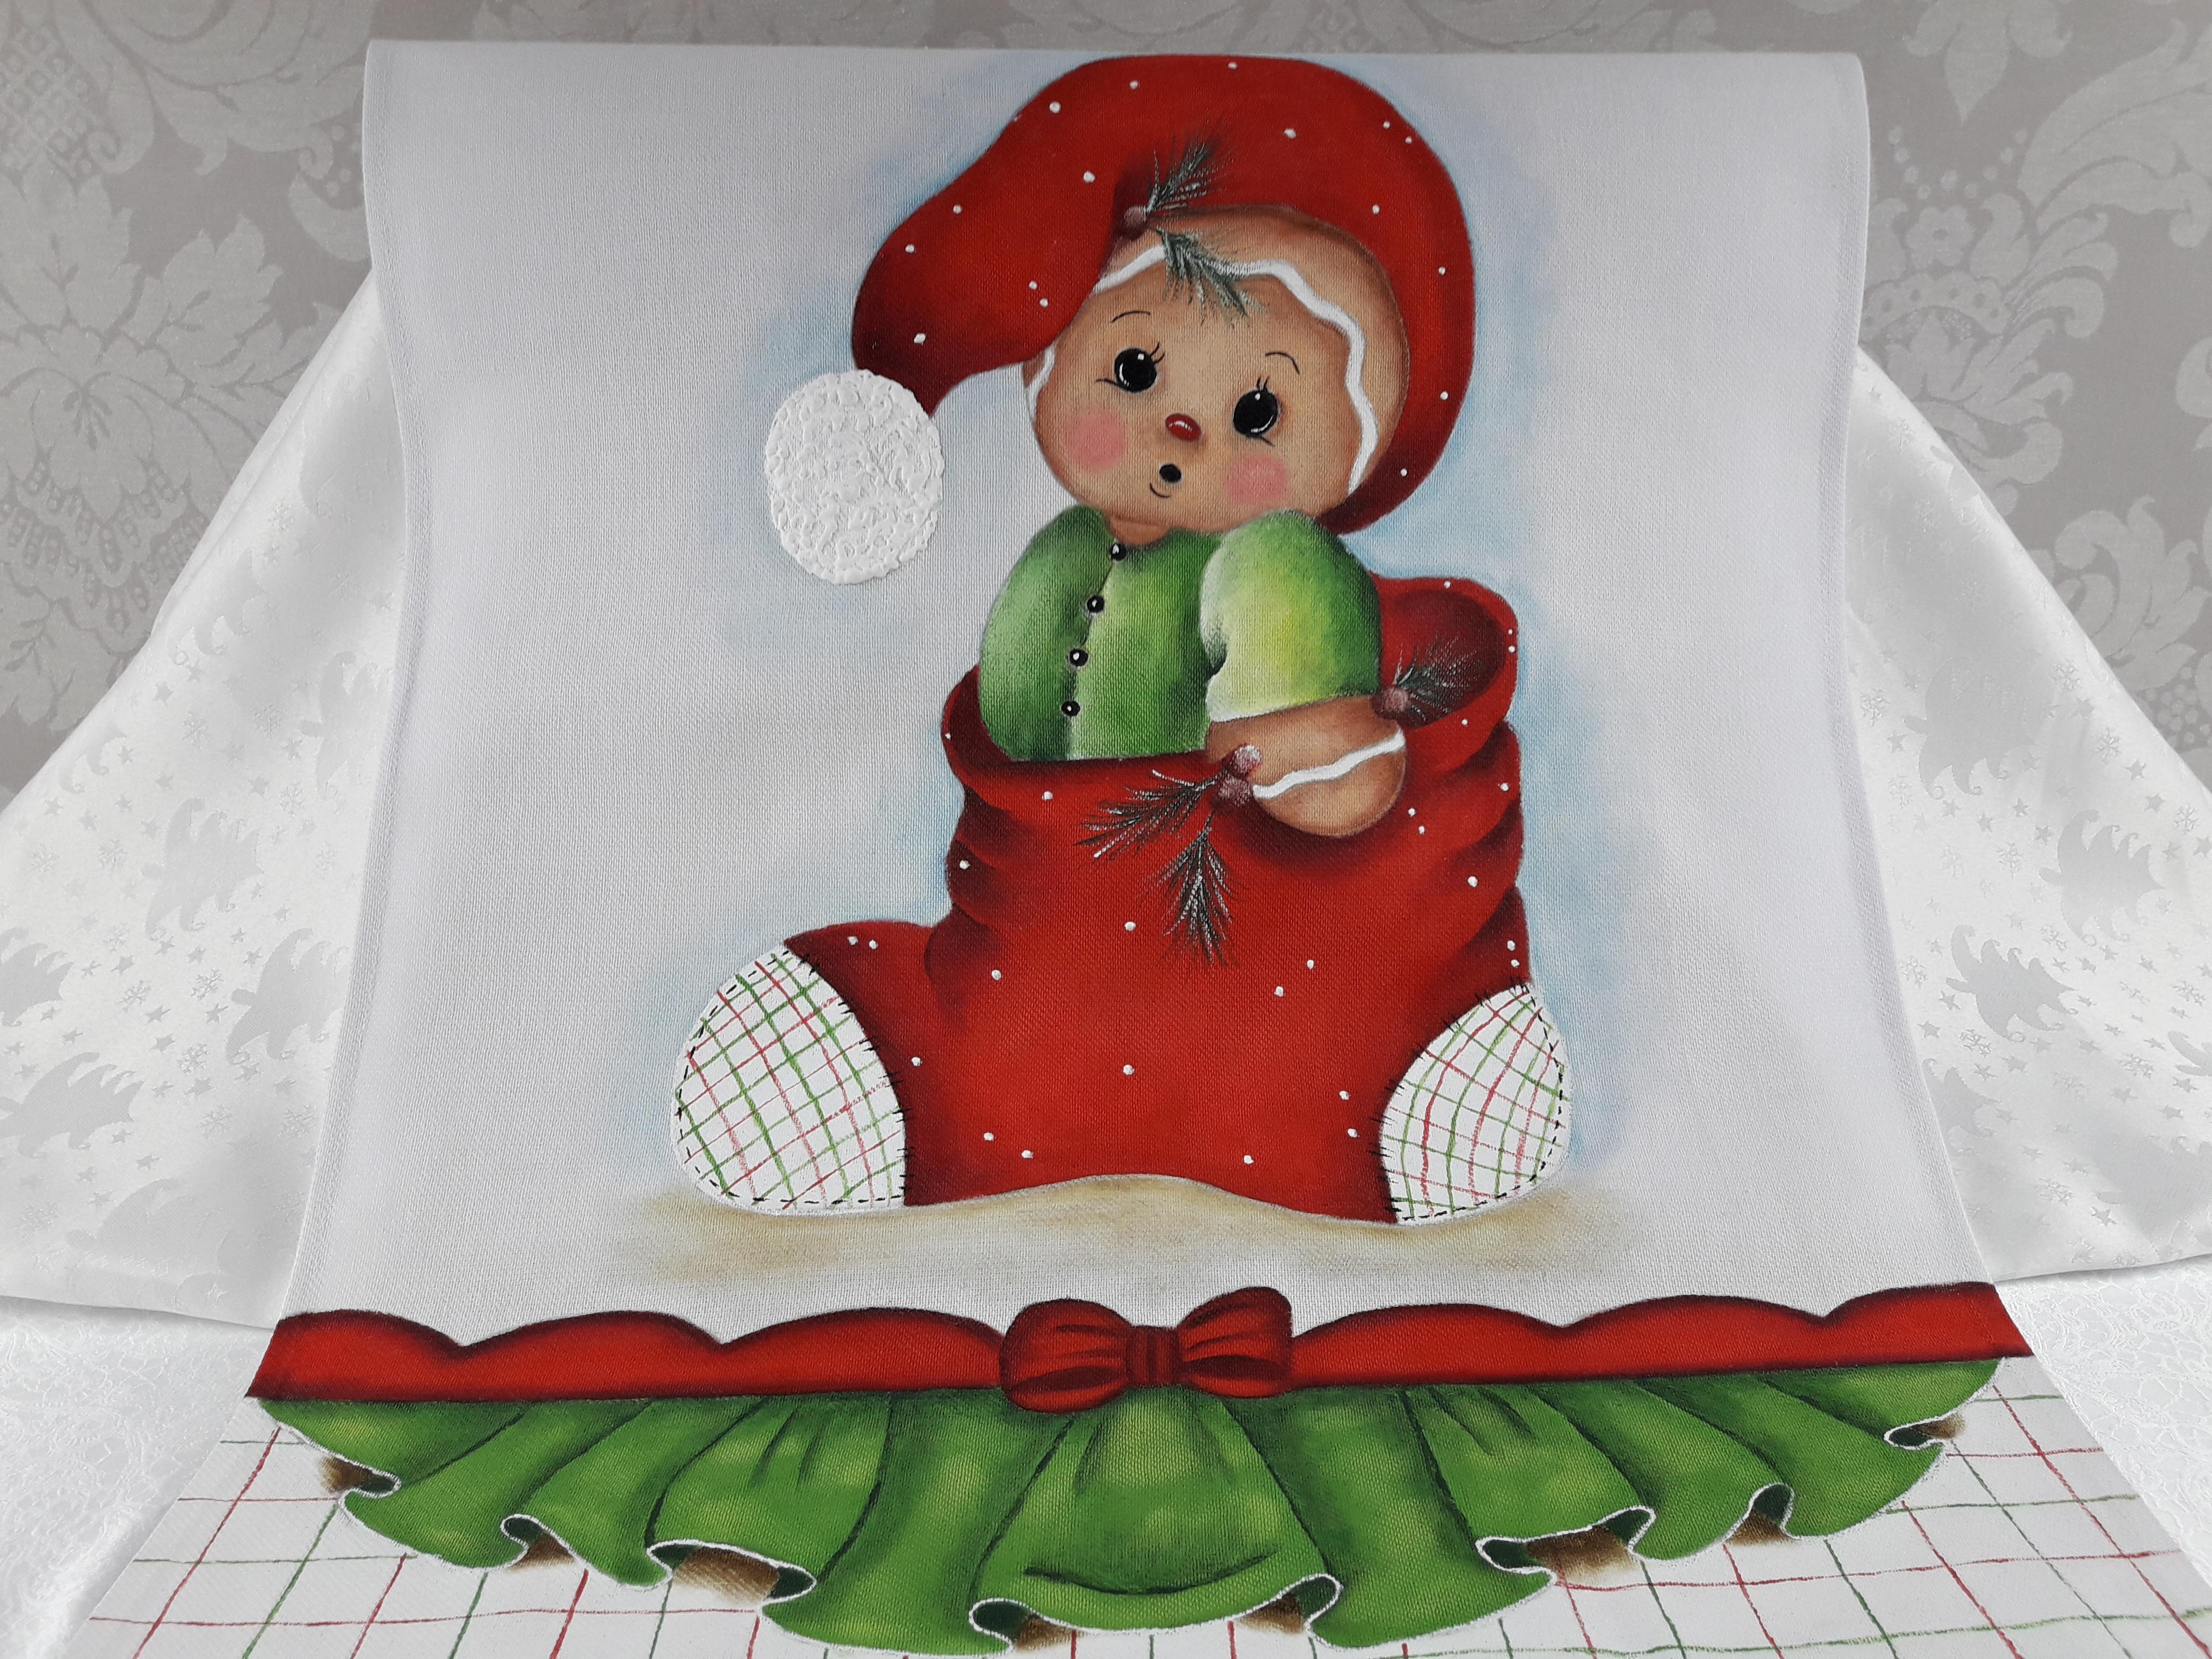 Pano De Prato Pintura Natal No Elo7 Bonecolandia B0567f